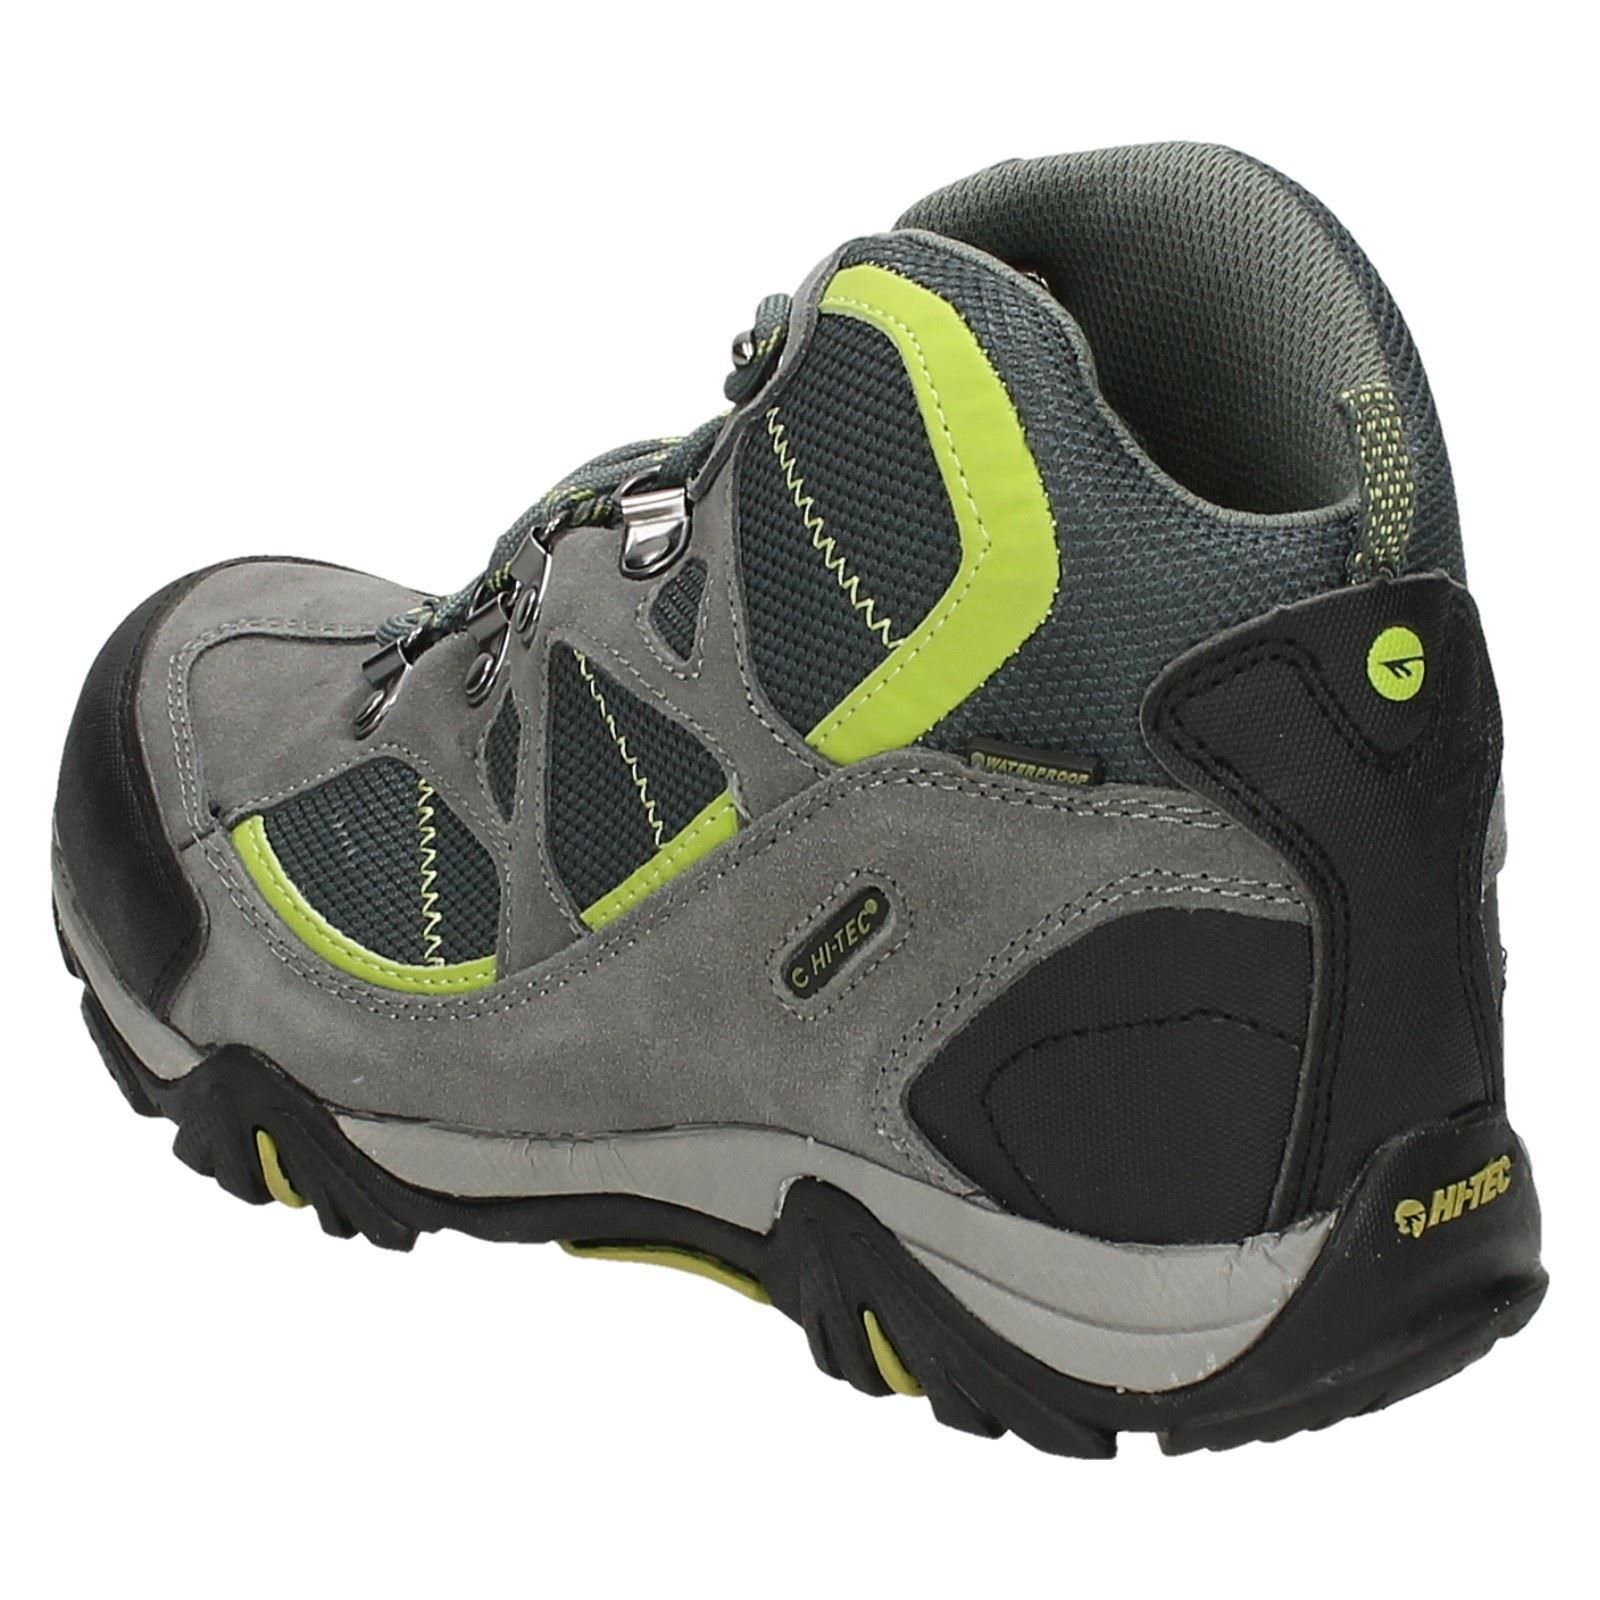 Boys Junior Hi-Tec Waterproof Walking Boots Label Renegade Trail WP JR